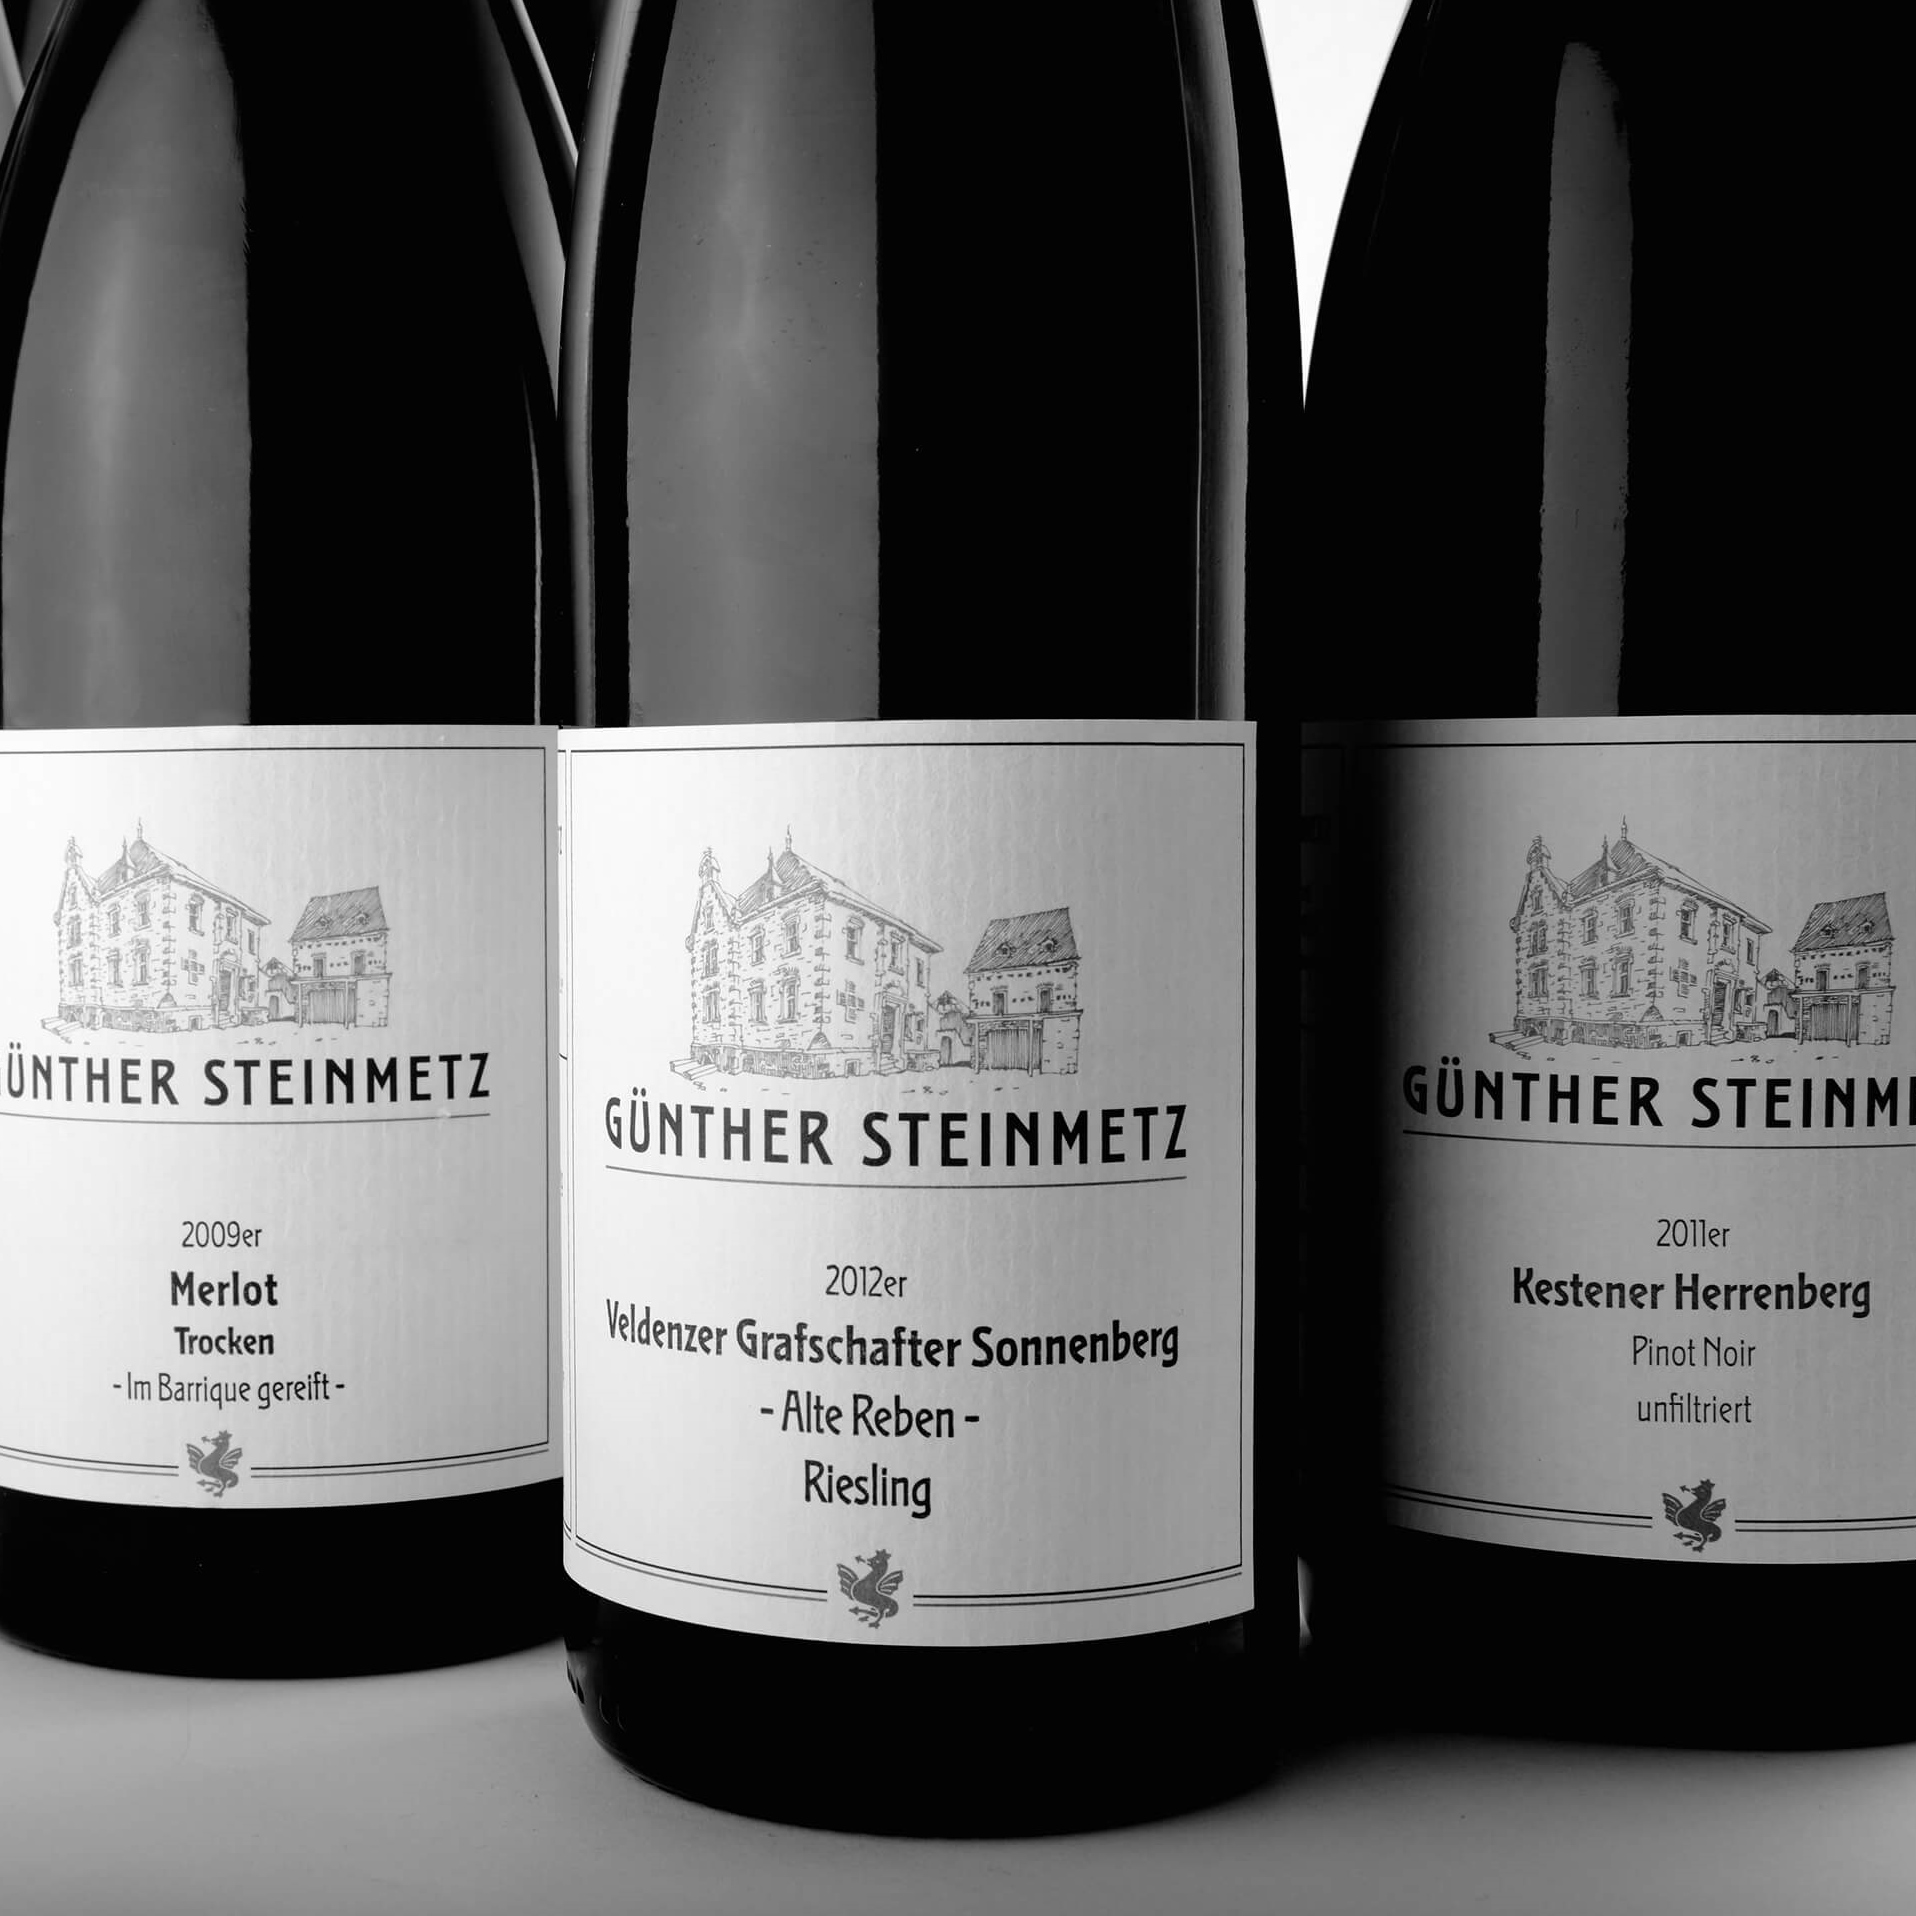 GUNTHER STEINMETZ Mosel | Broadbent